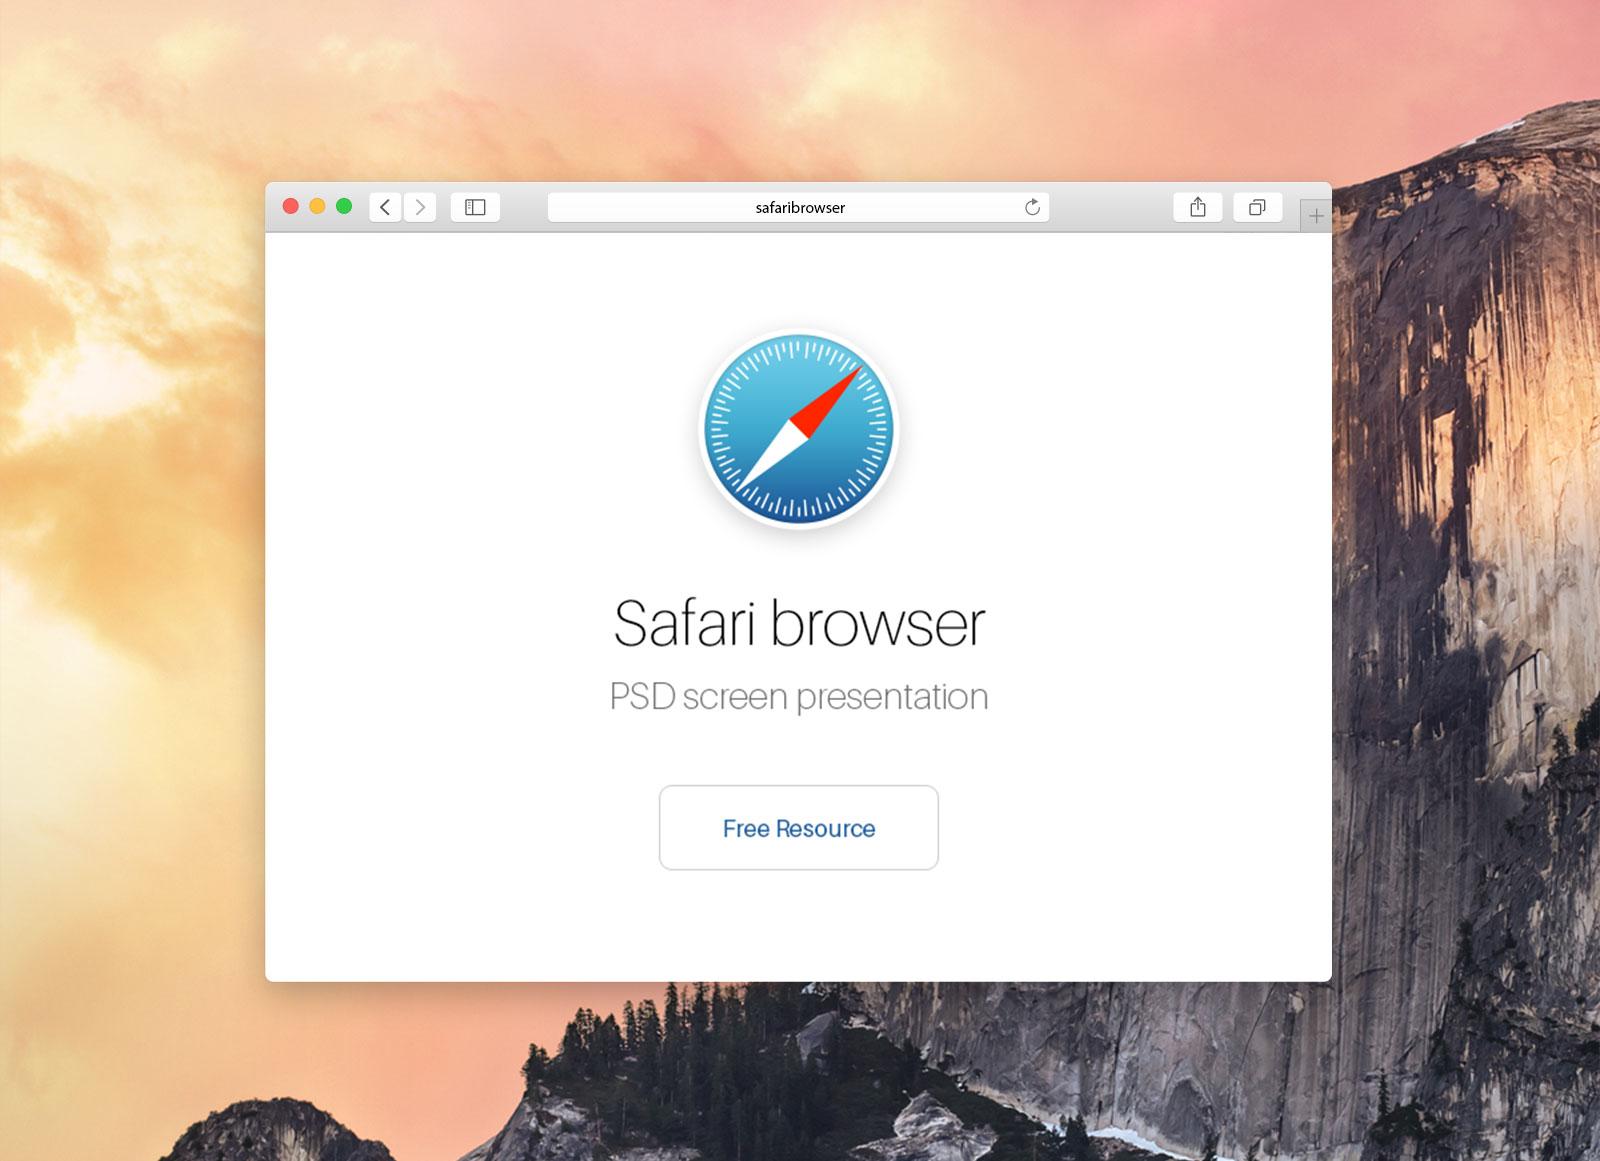 New-Safari-Browser-Mockup-PSD